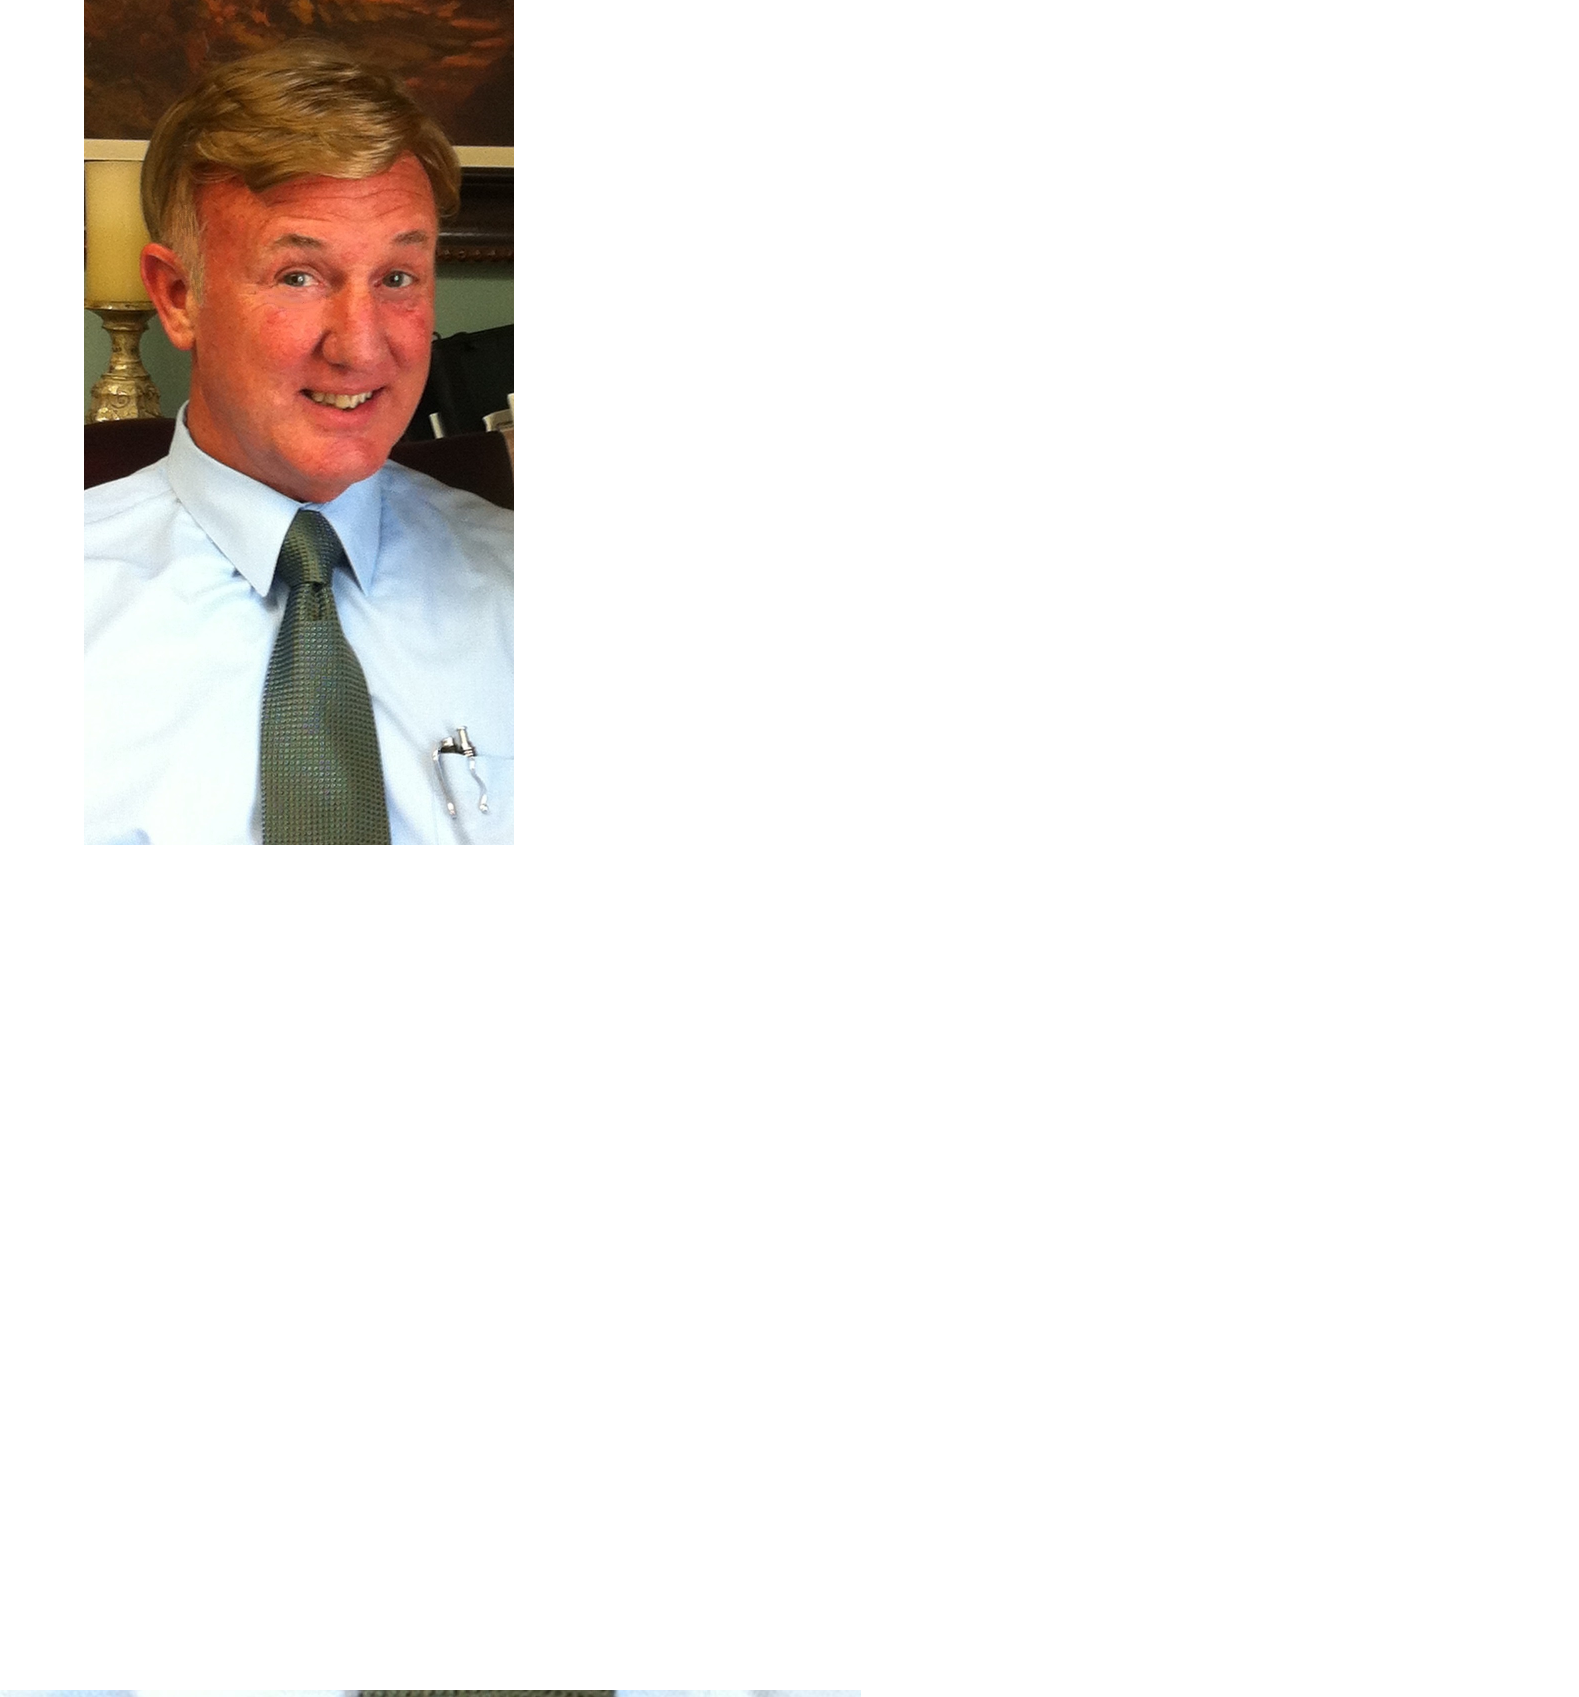 Craig Cherry | Health and Life Insurance Agent | Colorado Springs, CO 80923